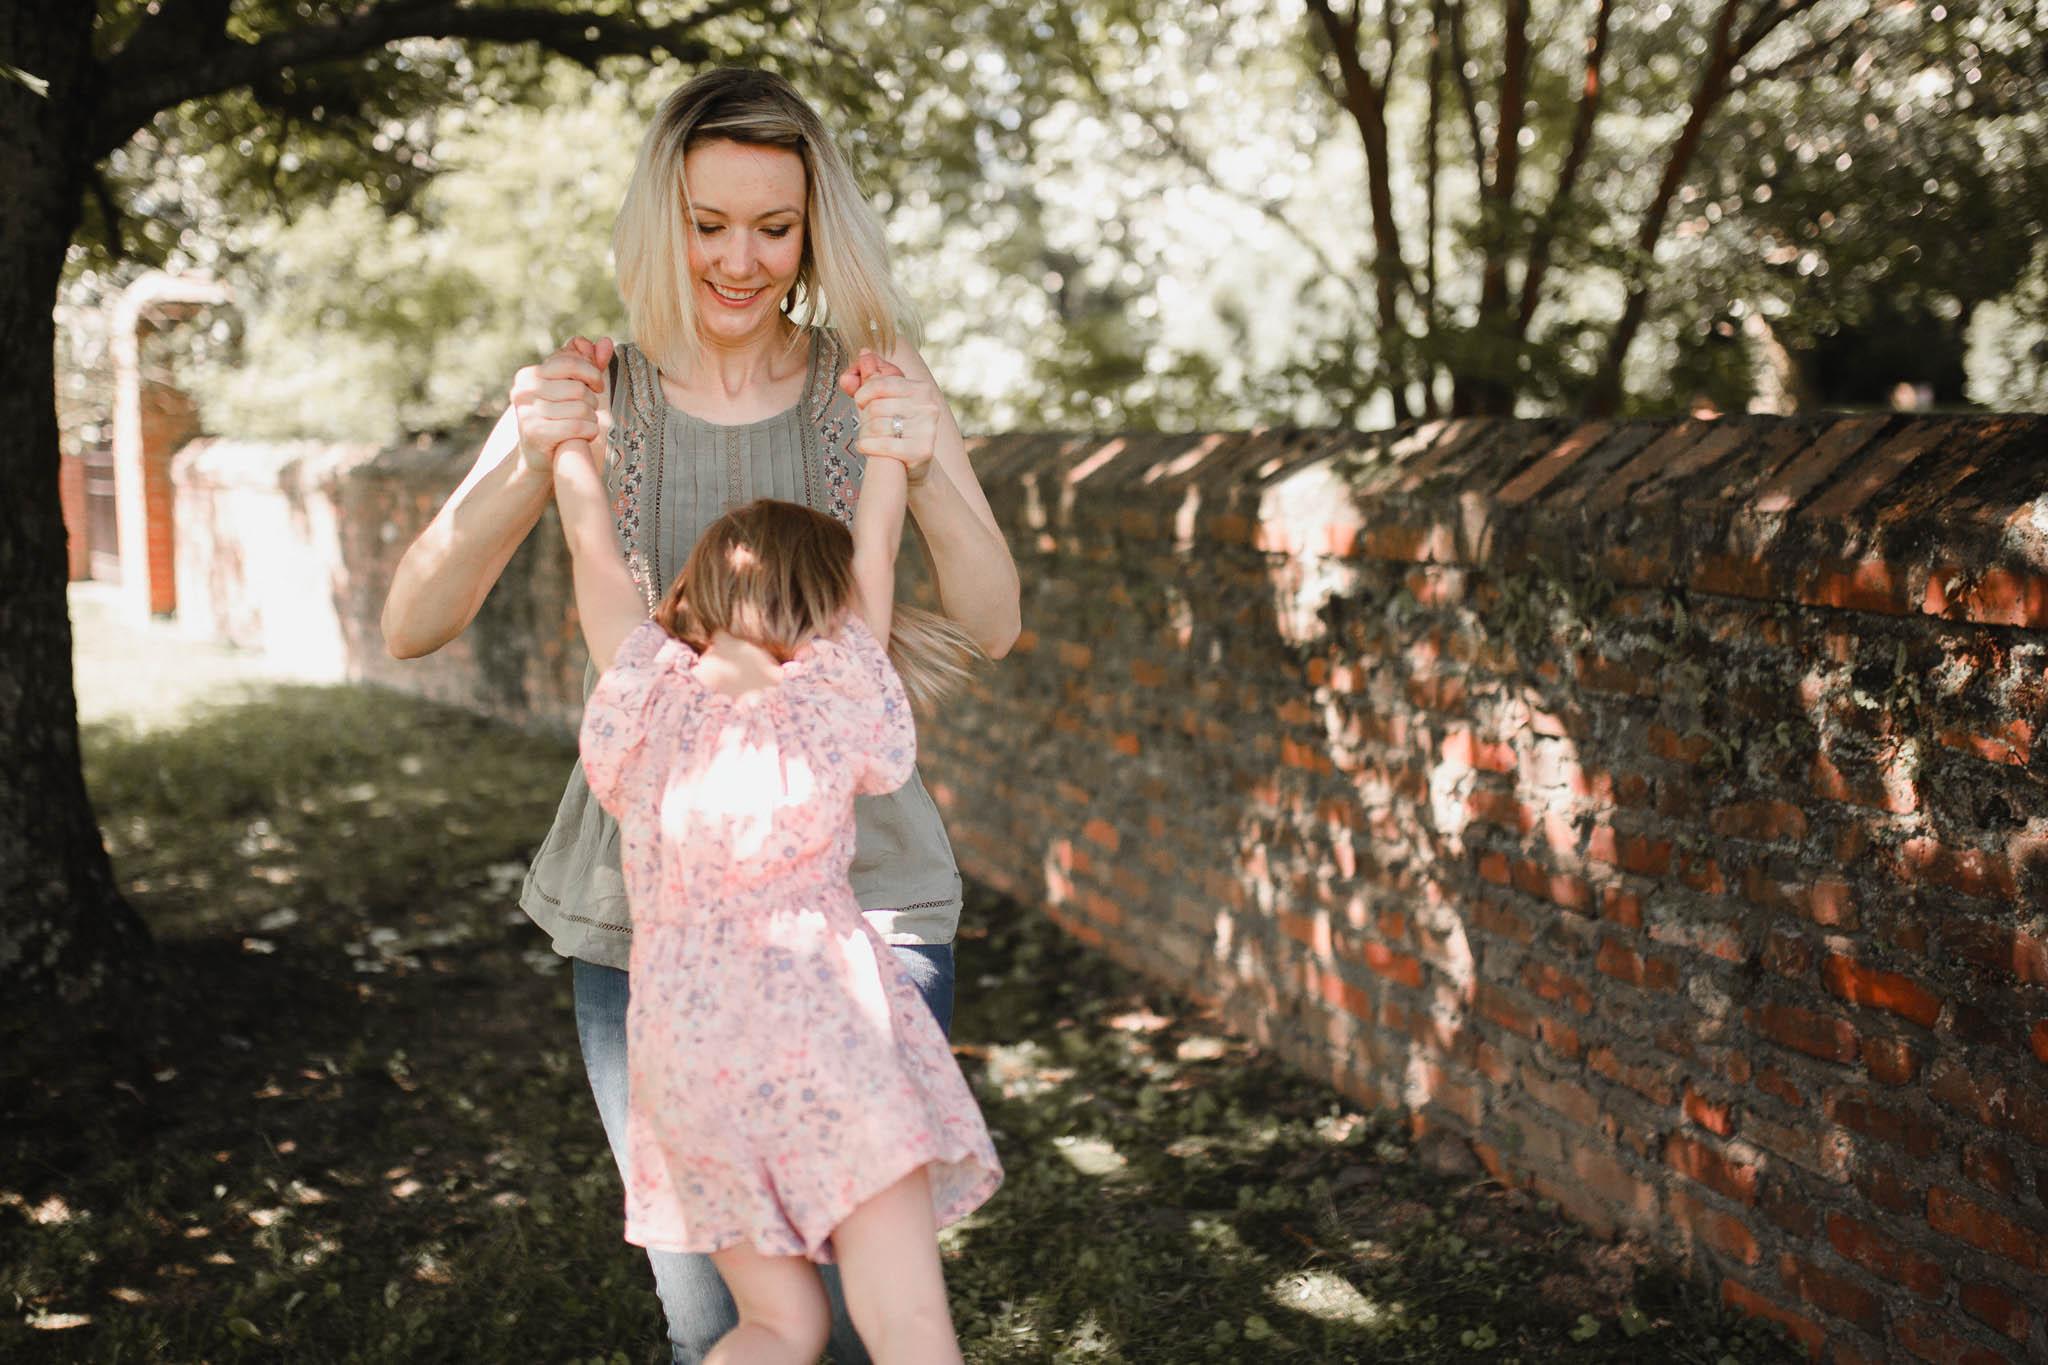 Mom twirling her daughter in a circle at Morven Park in Leesburg, Virginia